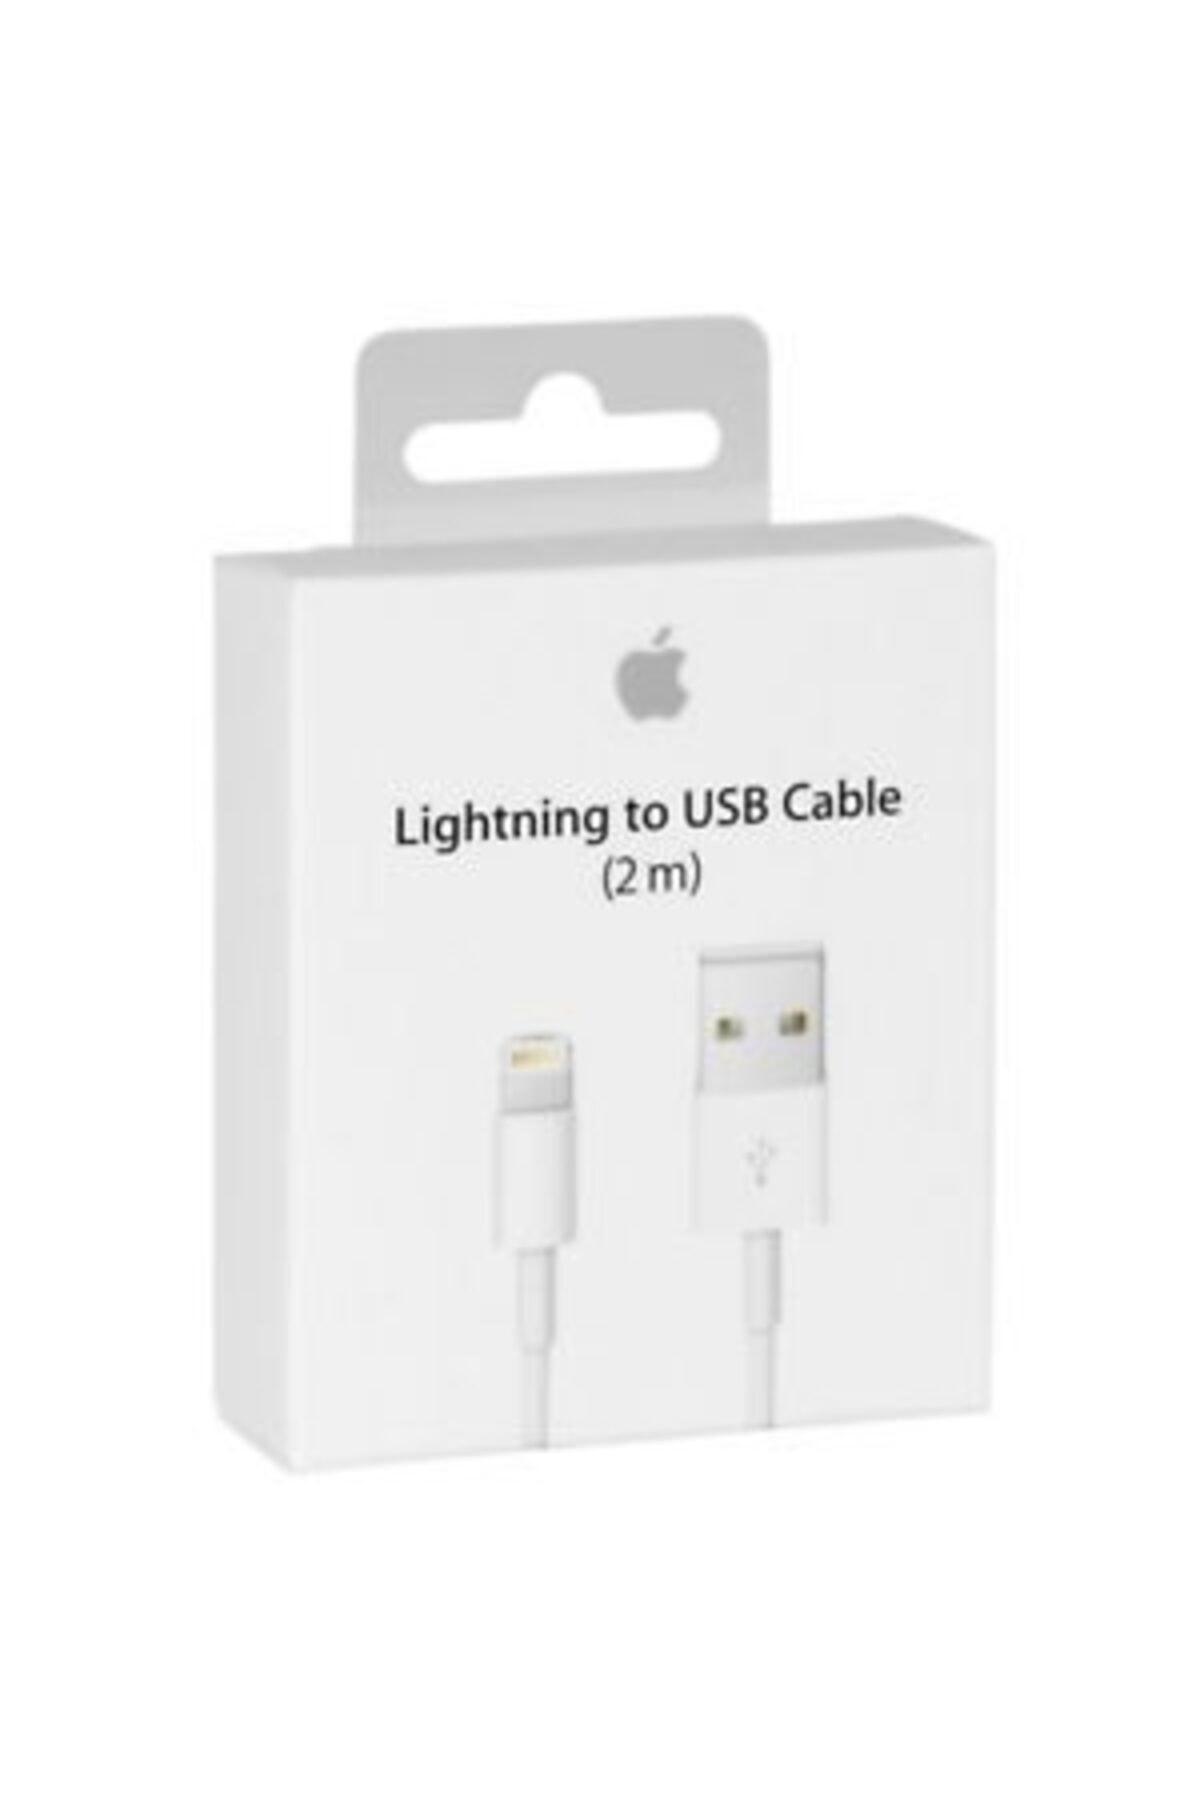 Apple 2 Metre Iphone Şarj Lıghtıng Uyumlu Usb Data Kablosu 5 5s Se 6 6s 6 Plus 7 7 Plus 8 8 Plus X Xs Max 2